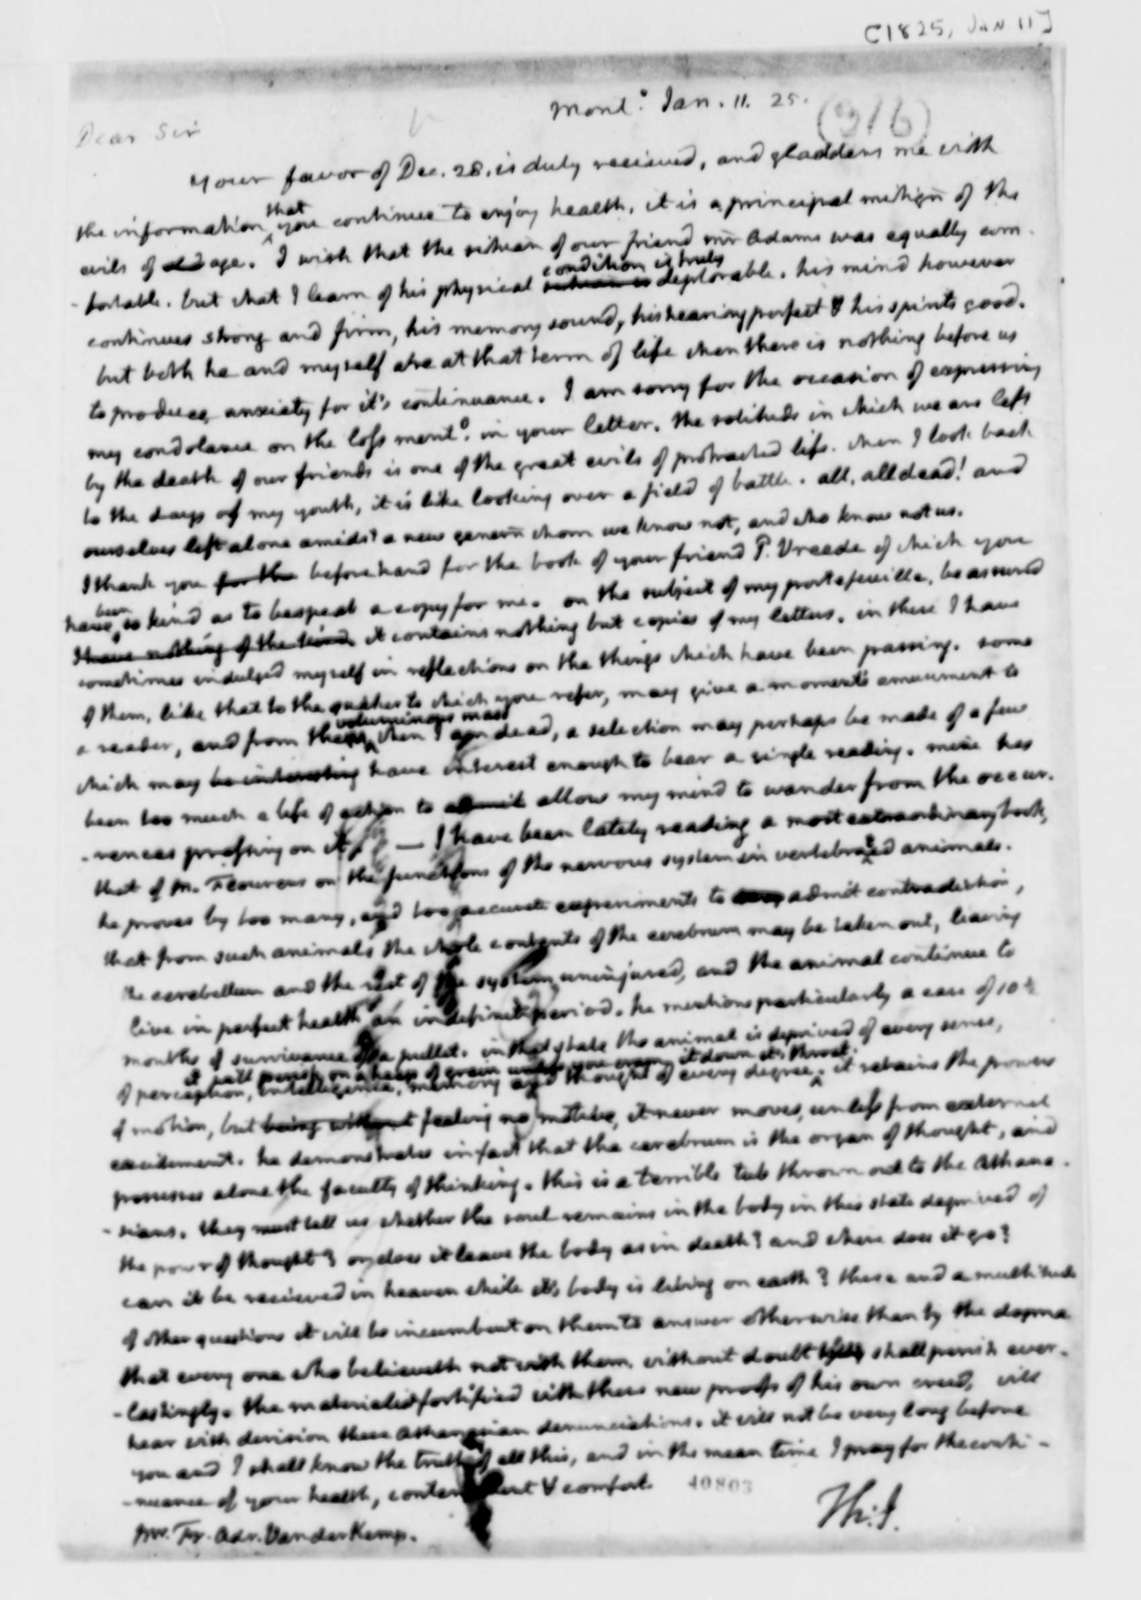 Thomas Jefferson to Francis A. van der Kemp, January 11, 1825